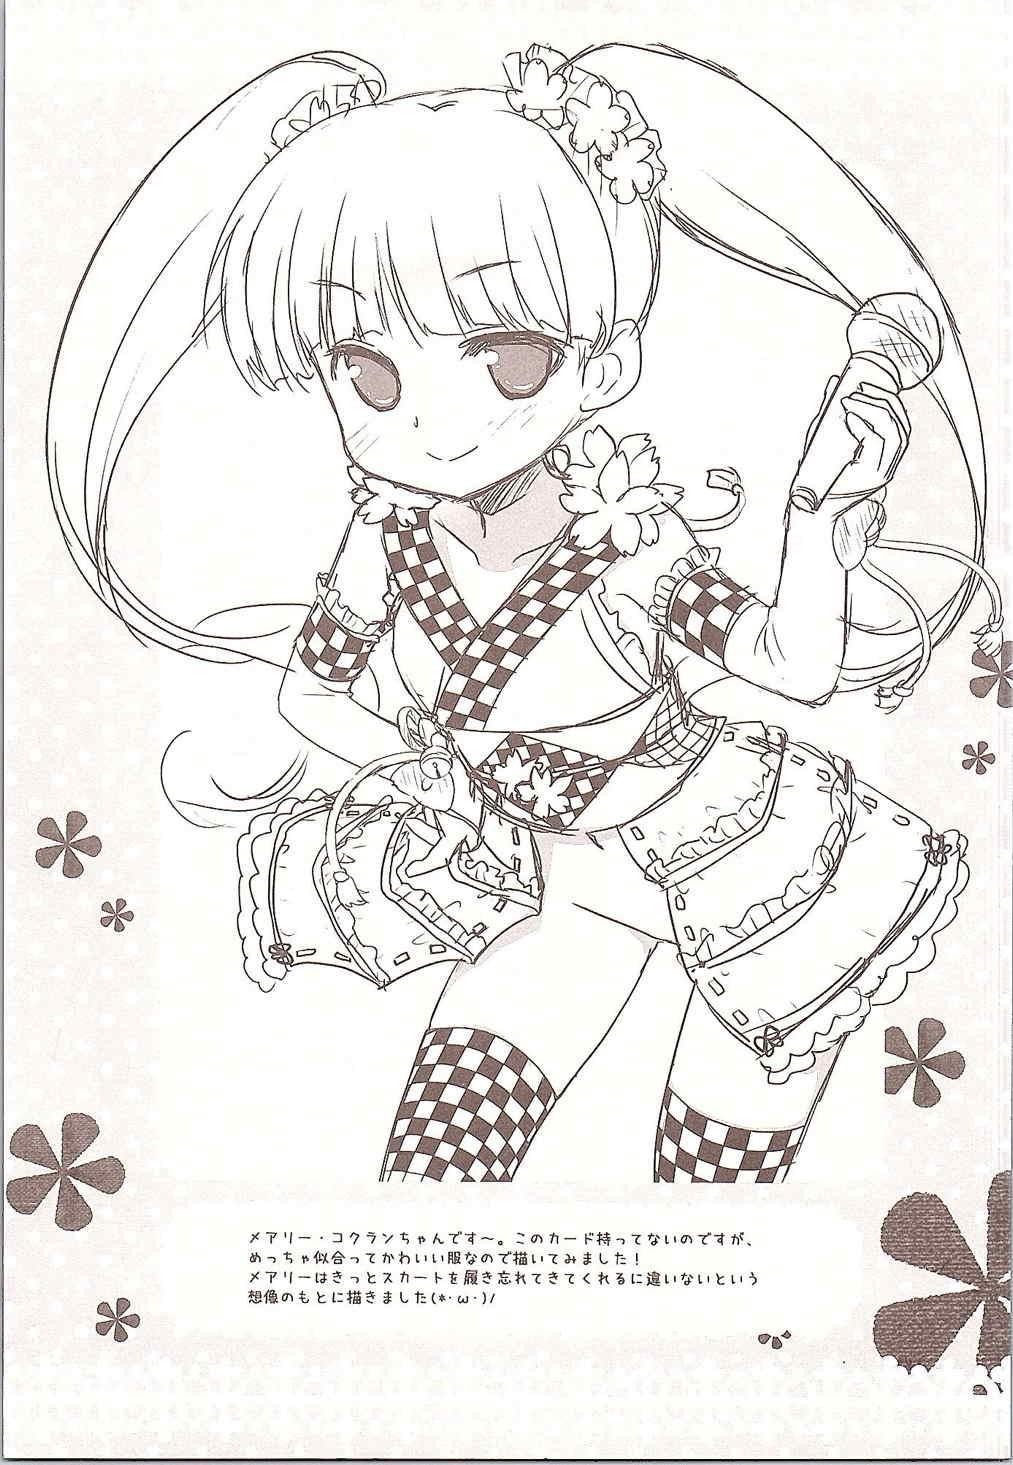 Nina-chan to, Issho. 29